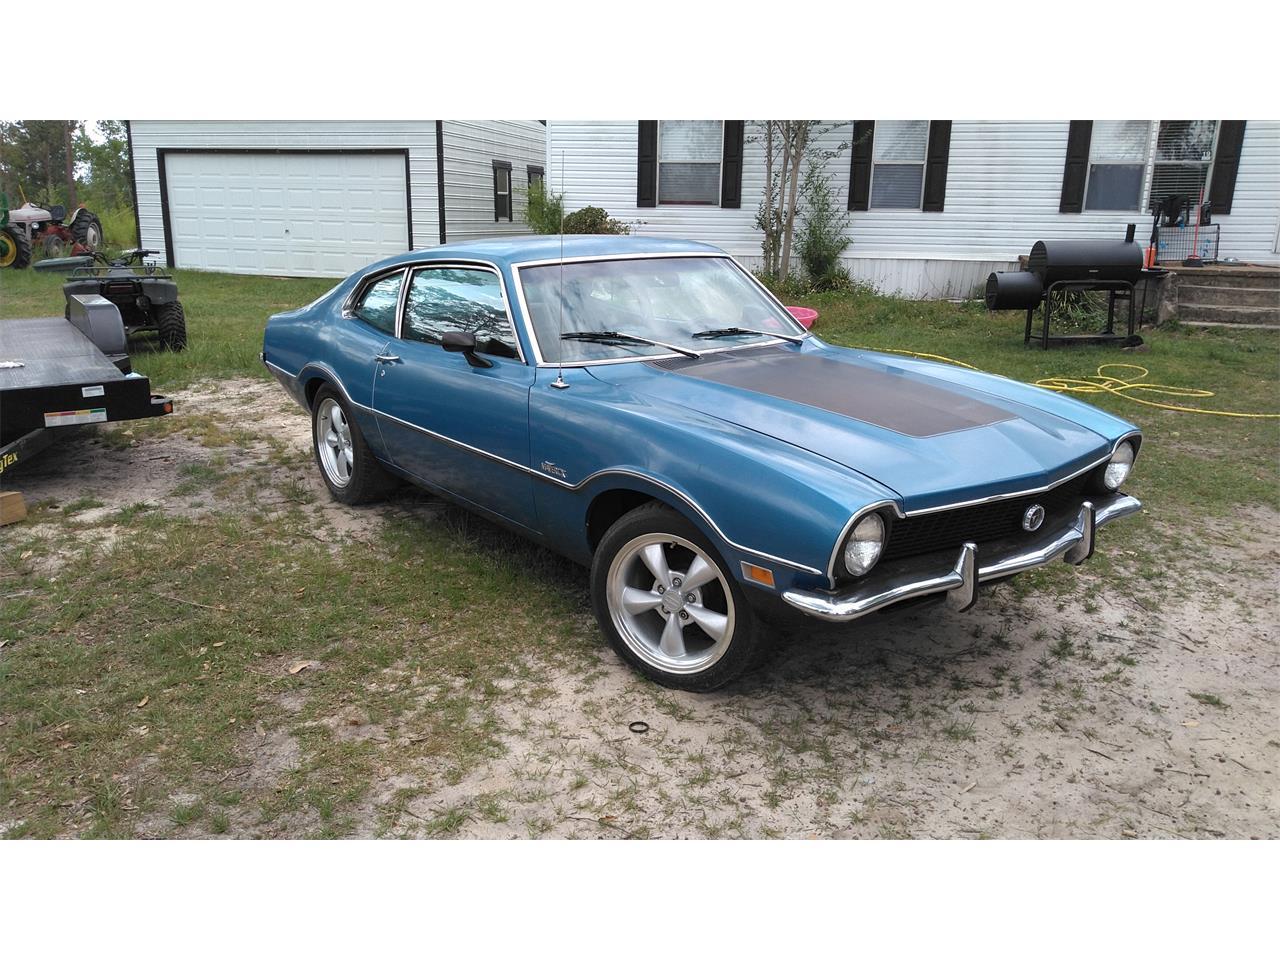 1972 Ford Maverick (CC-1308255) for sale in Bainbridge, Georgia